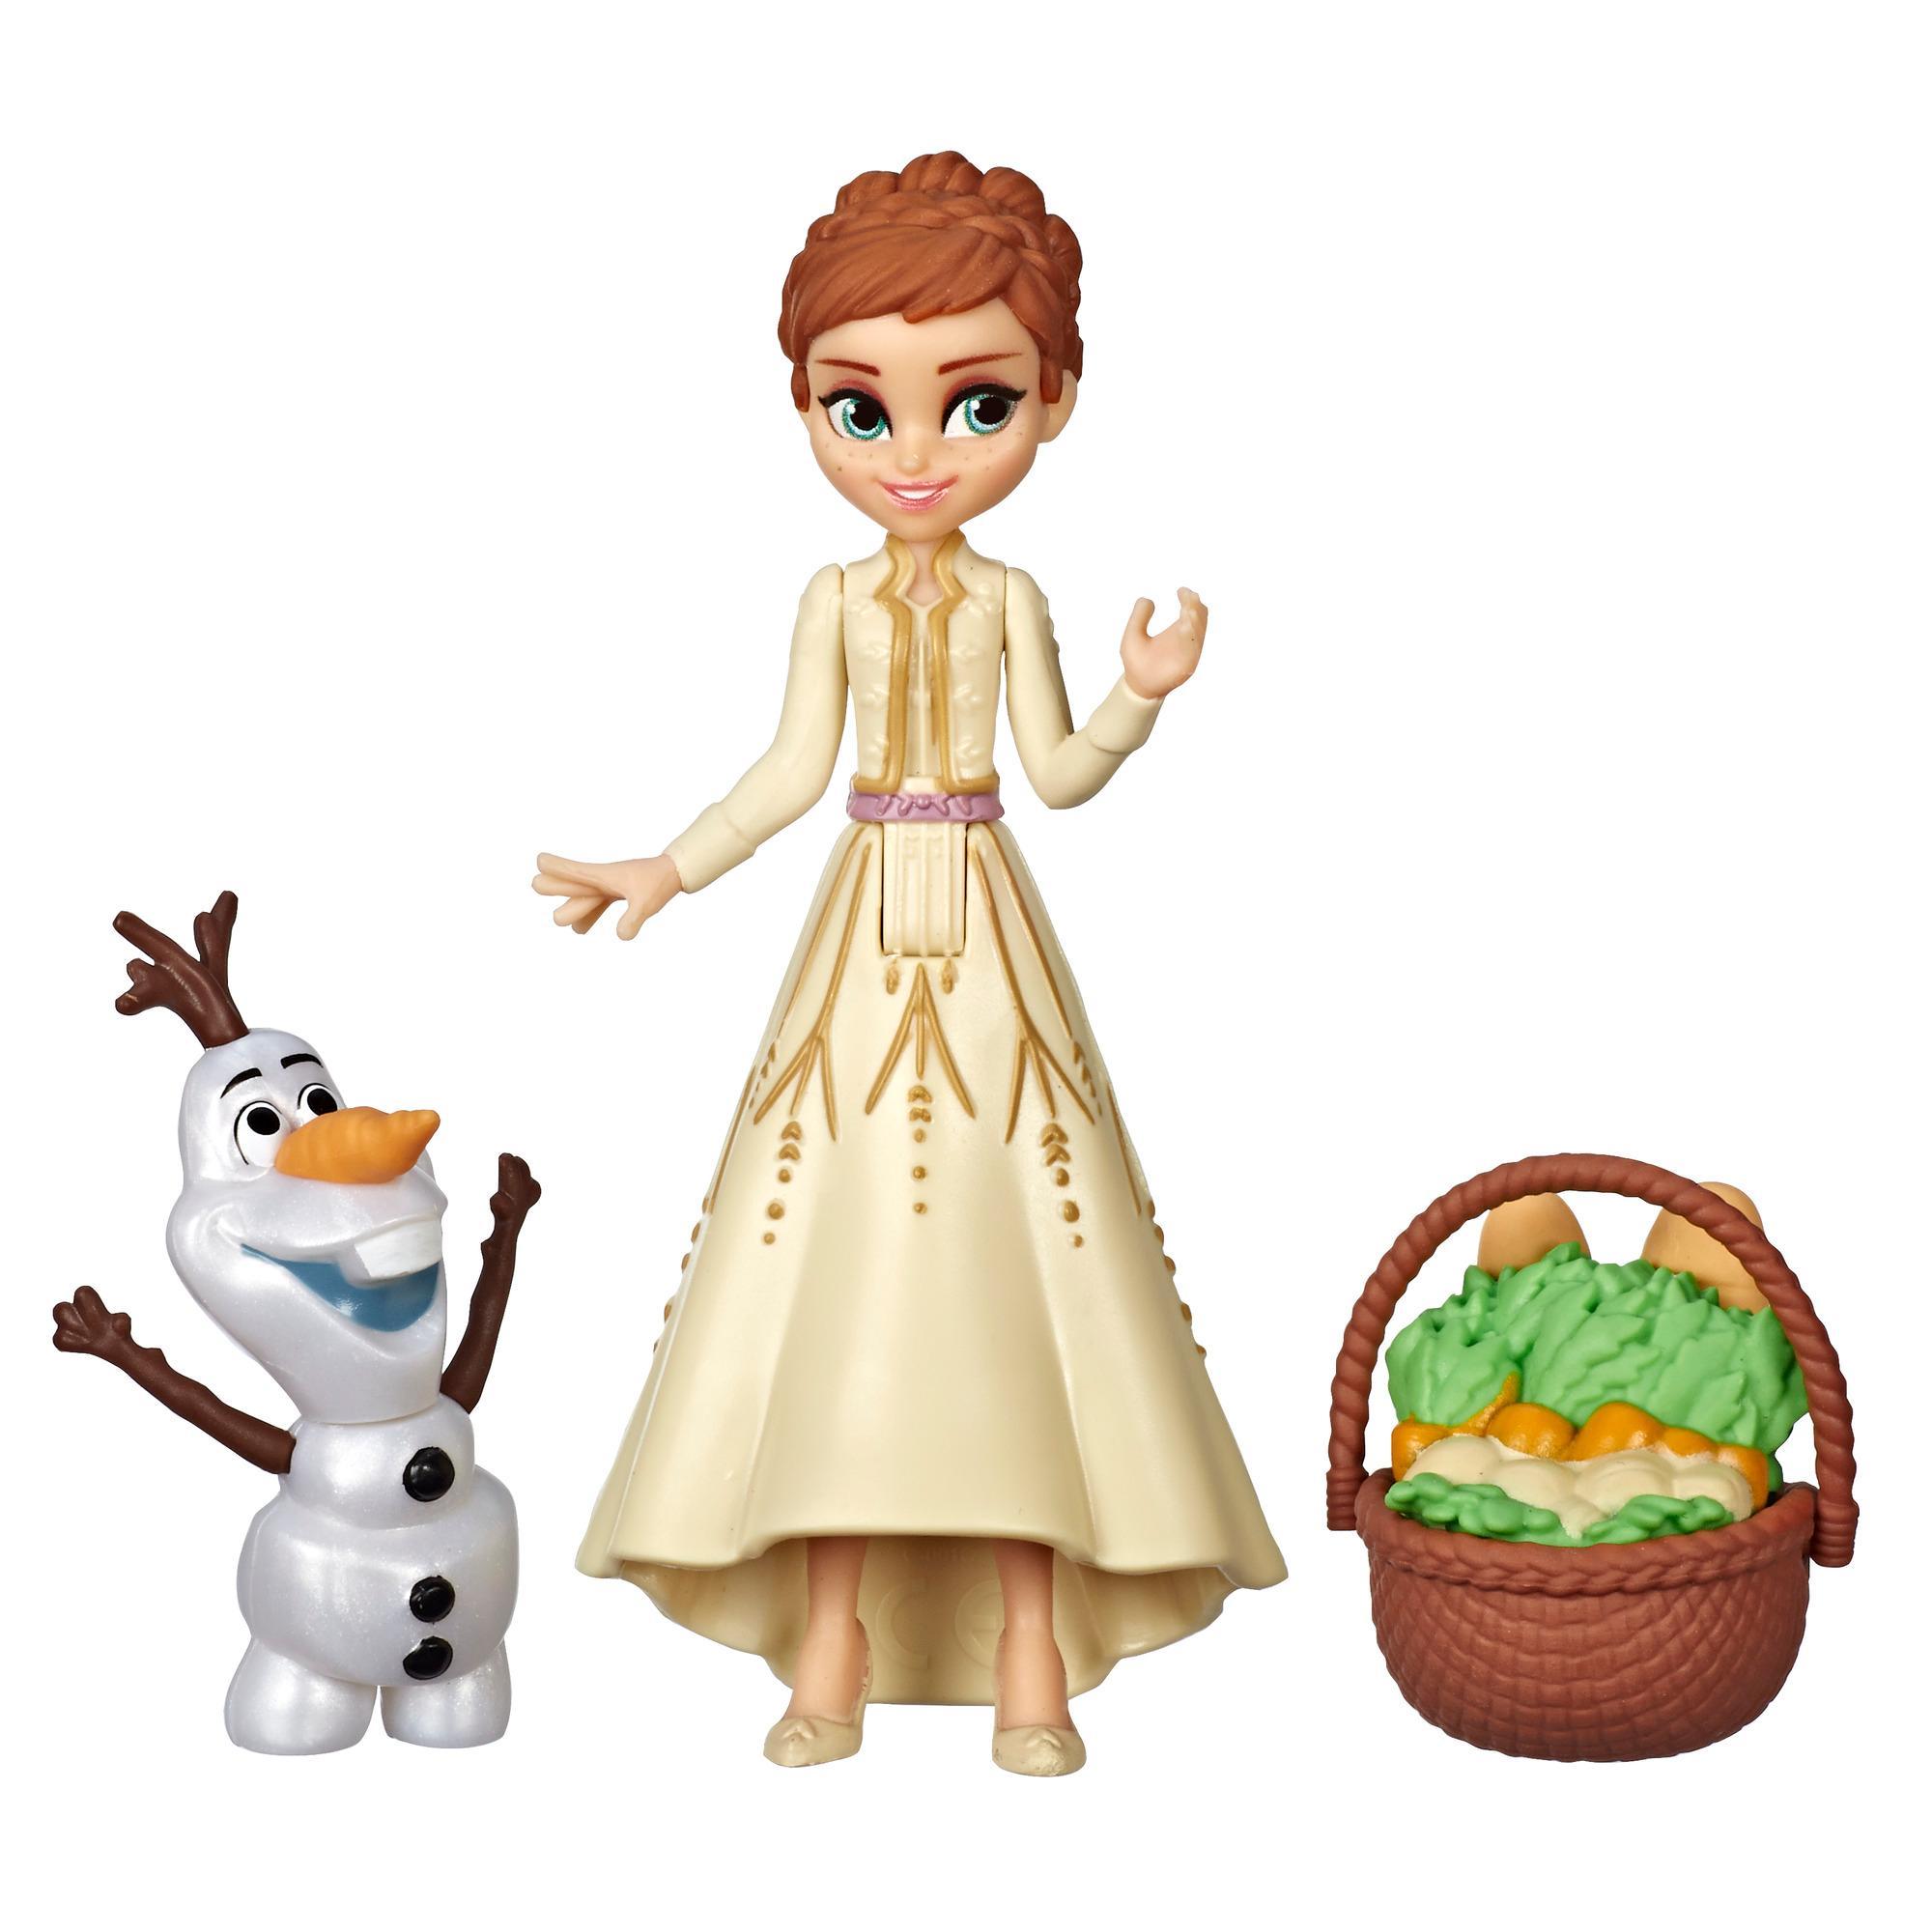 Frozen 2, Μικρή φιγούρα Άννας με τον Όλαφ